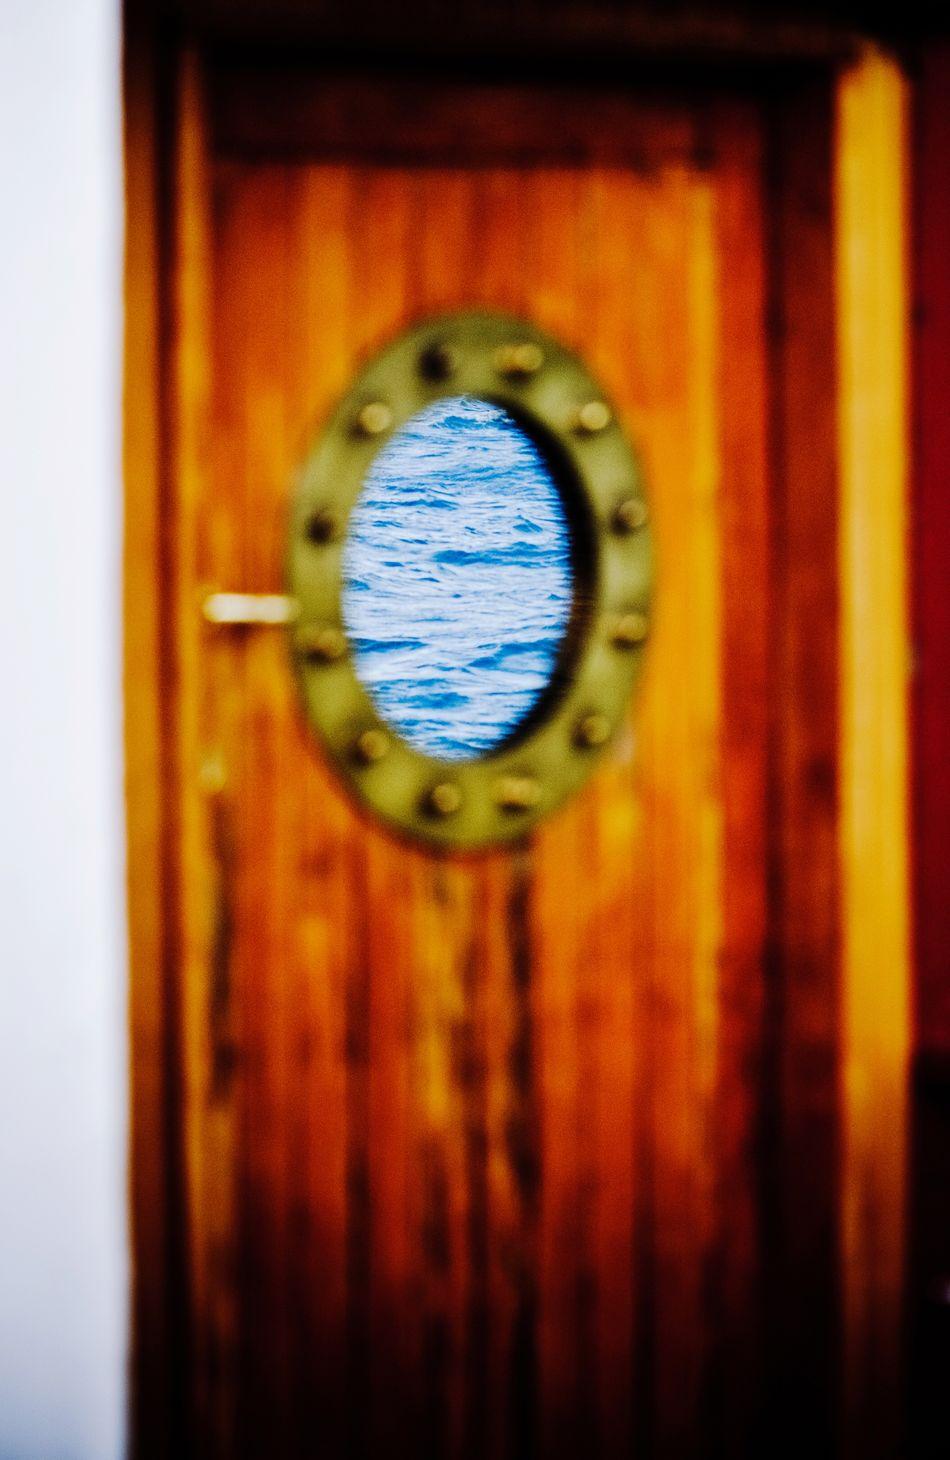 Port Hole Door Porthole Reflection Water Ocean Wooden